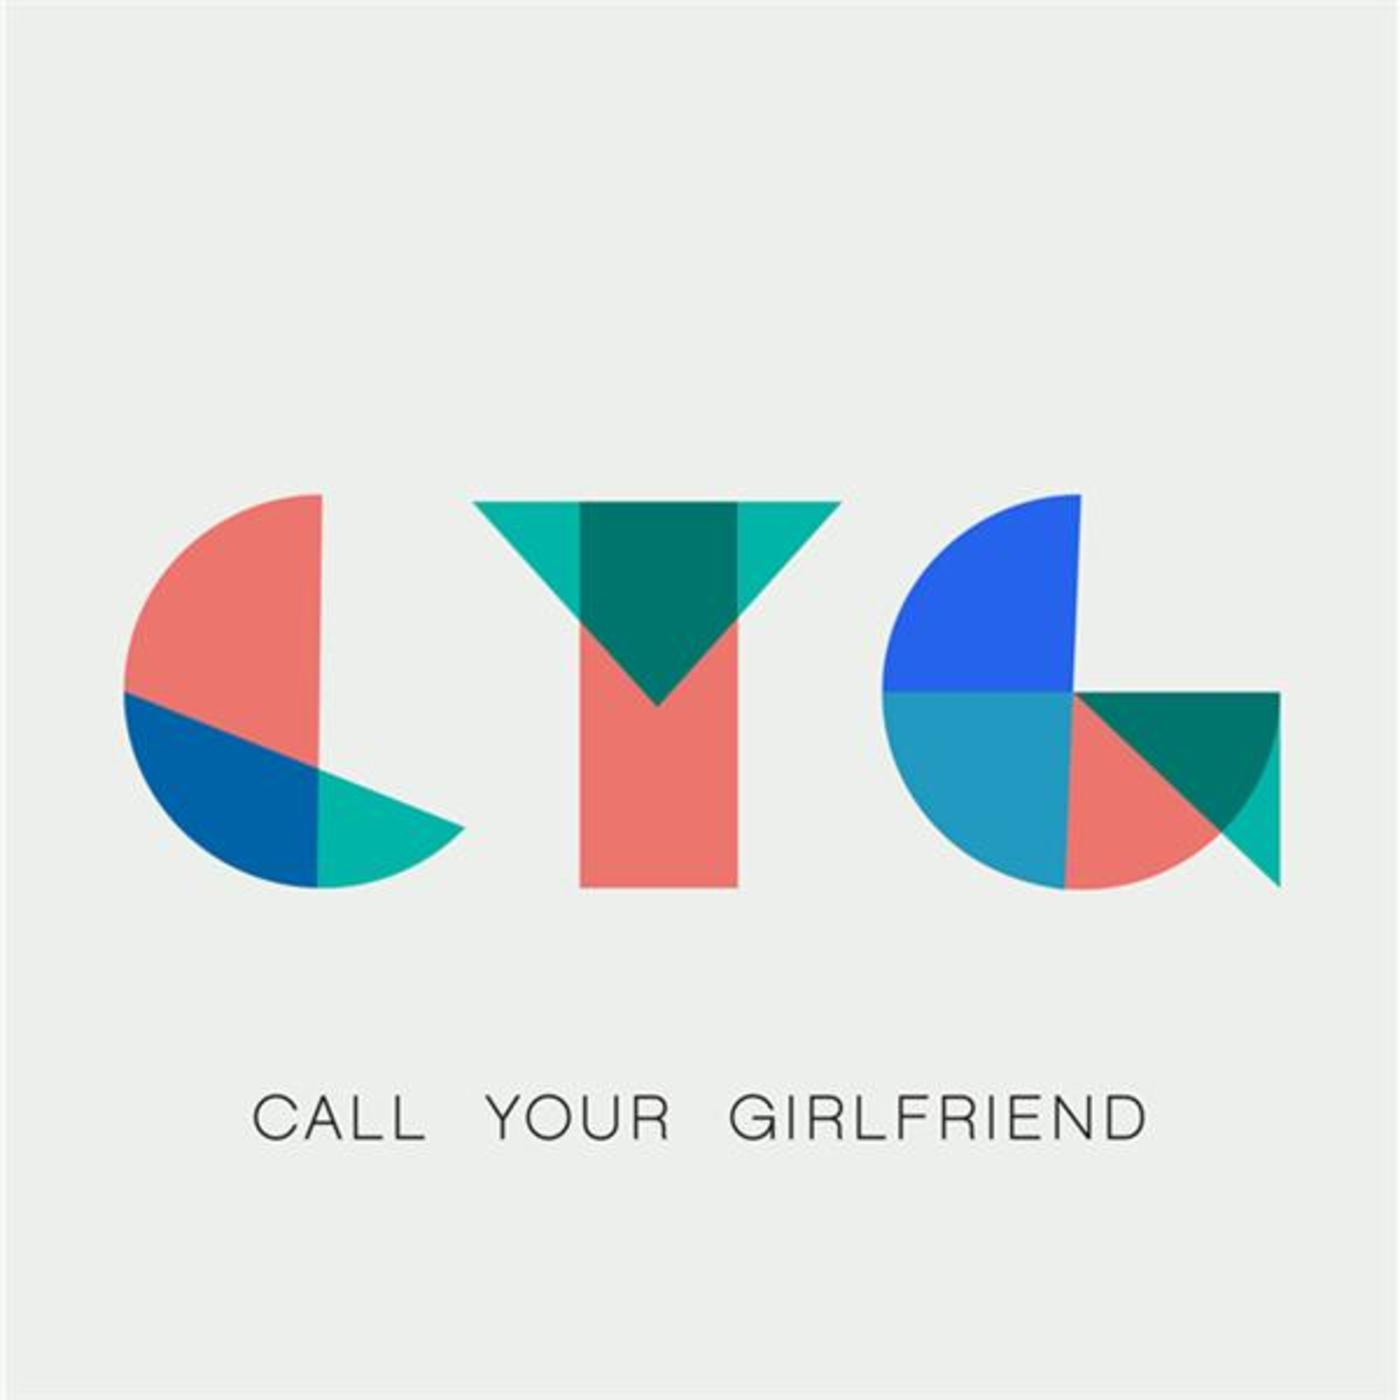 call yr gf.jpg